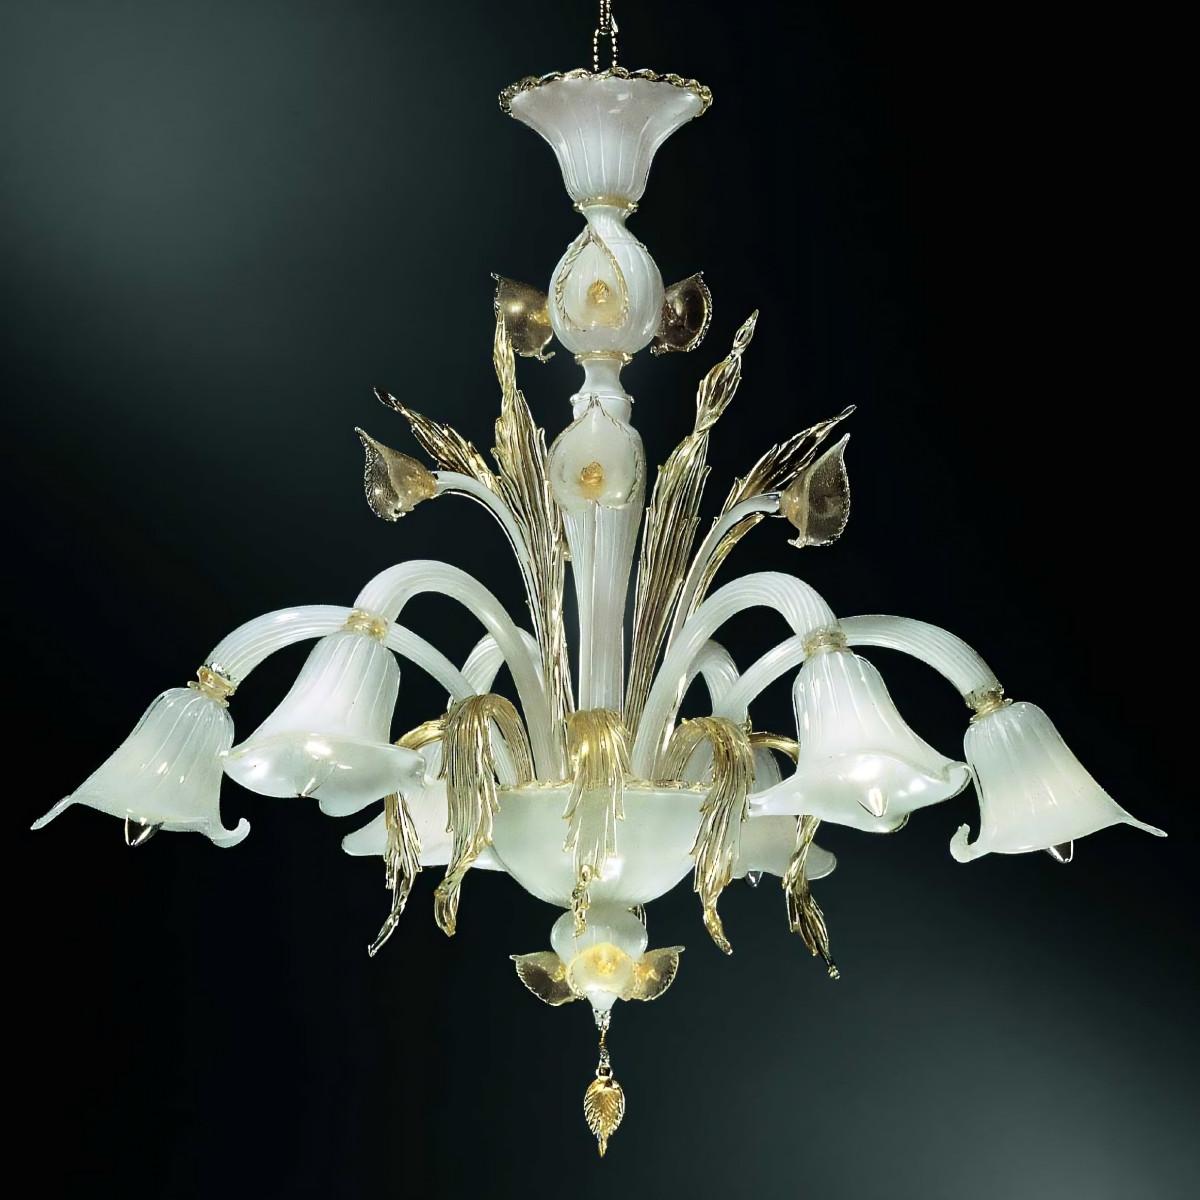 Laguna 6 luces lampara Murano - color blanco y oro